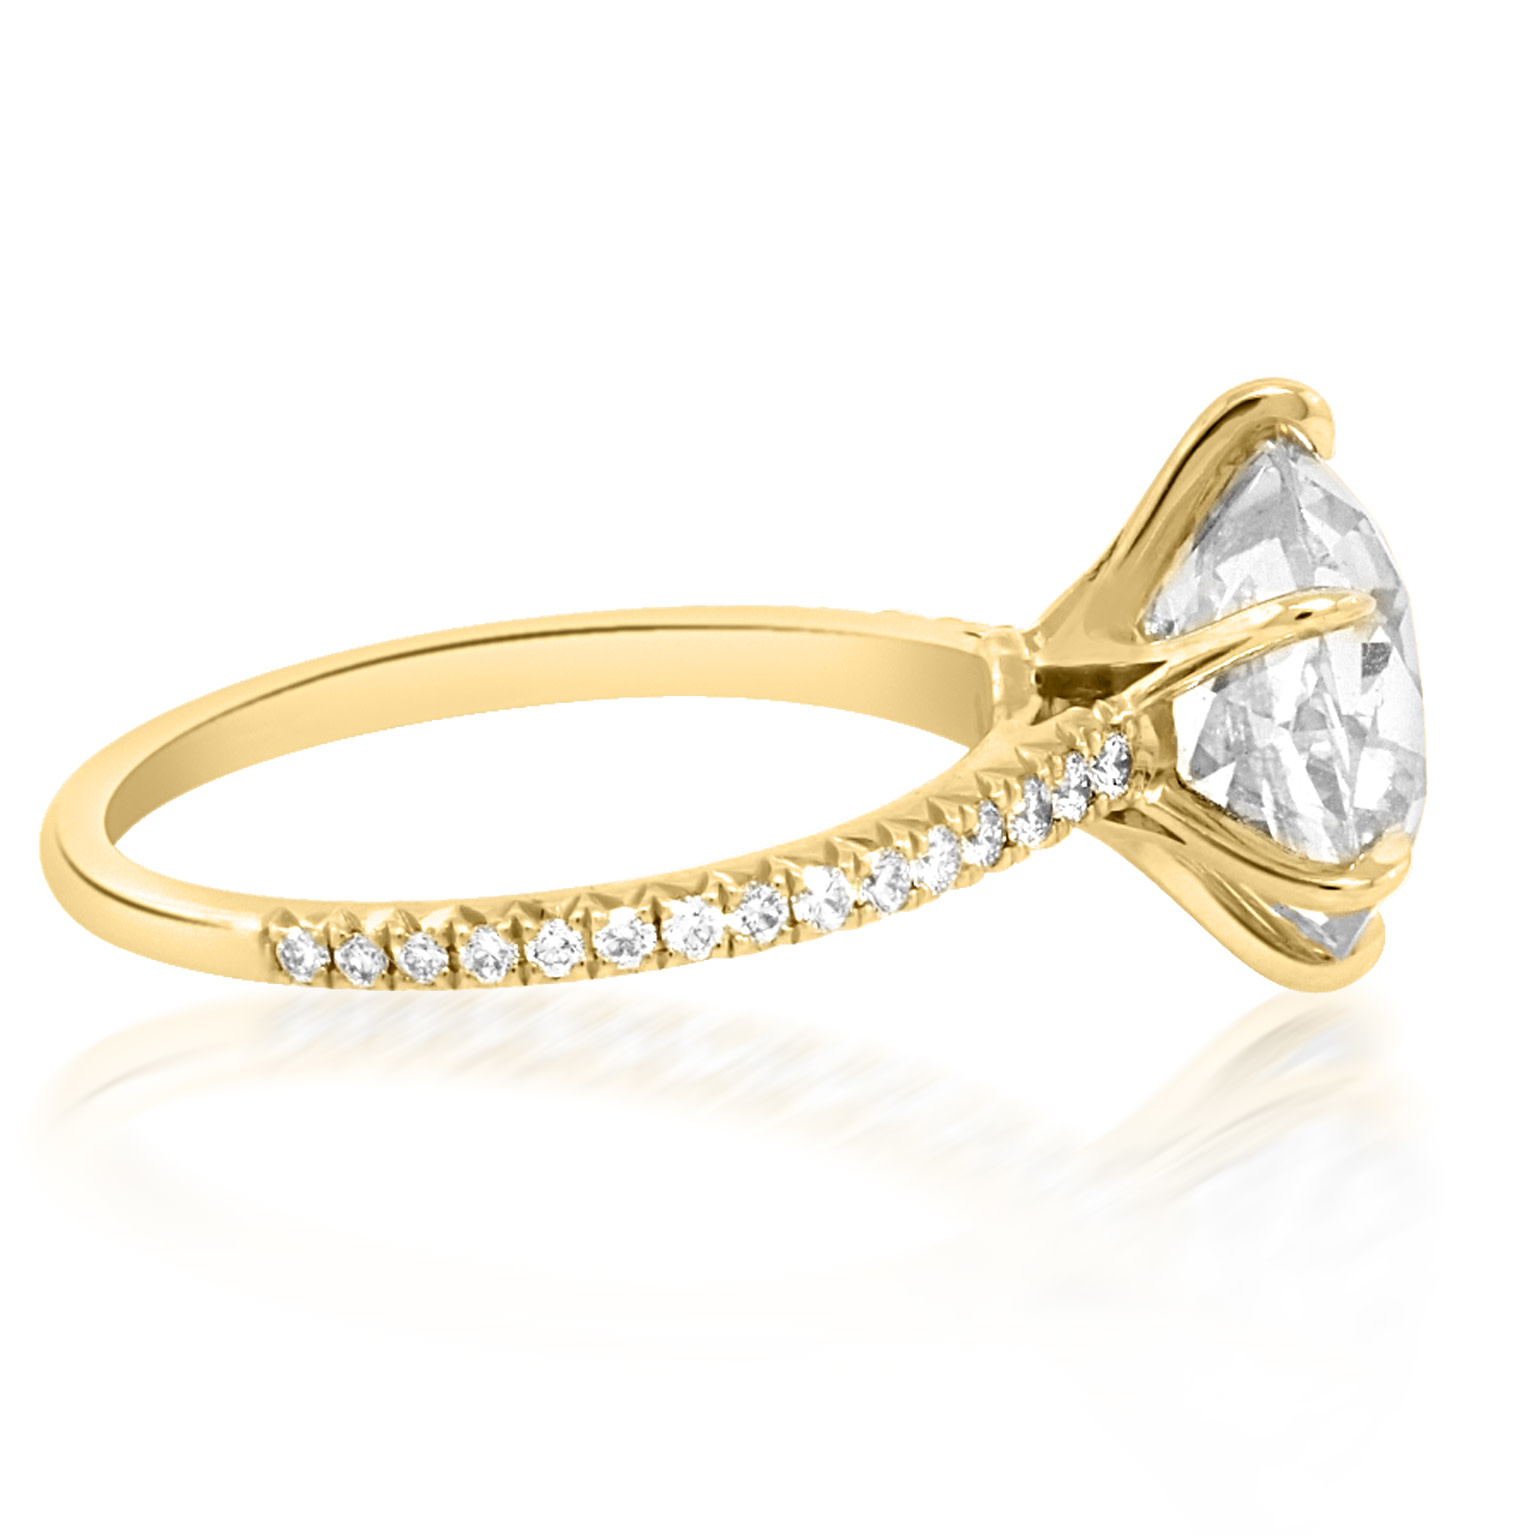 Trabert Goldsmiths 4.23ct Q/R SI1 Old Mine Cut Diamond  Eris Ring